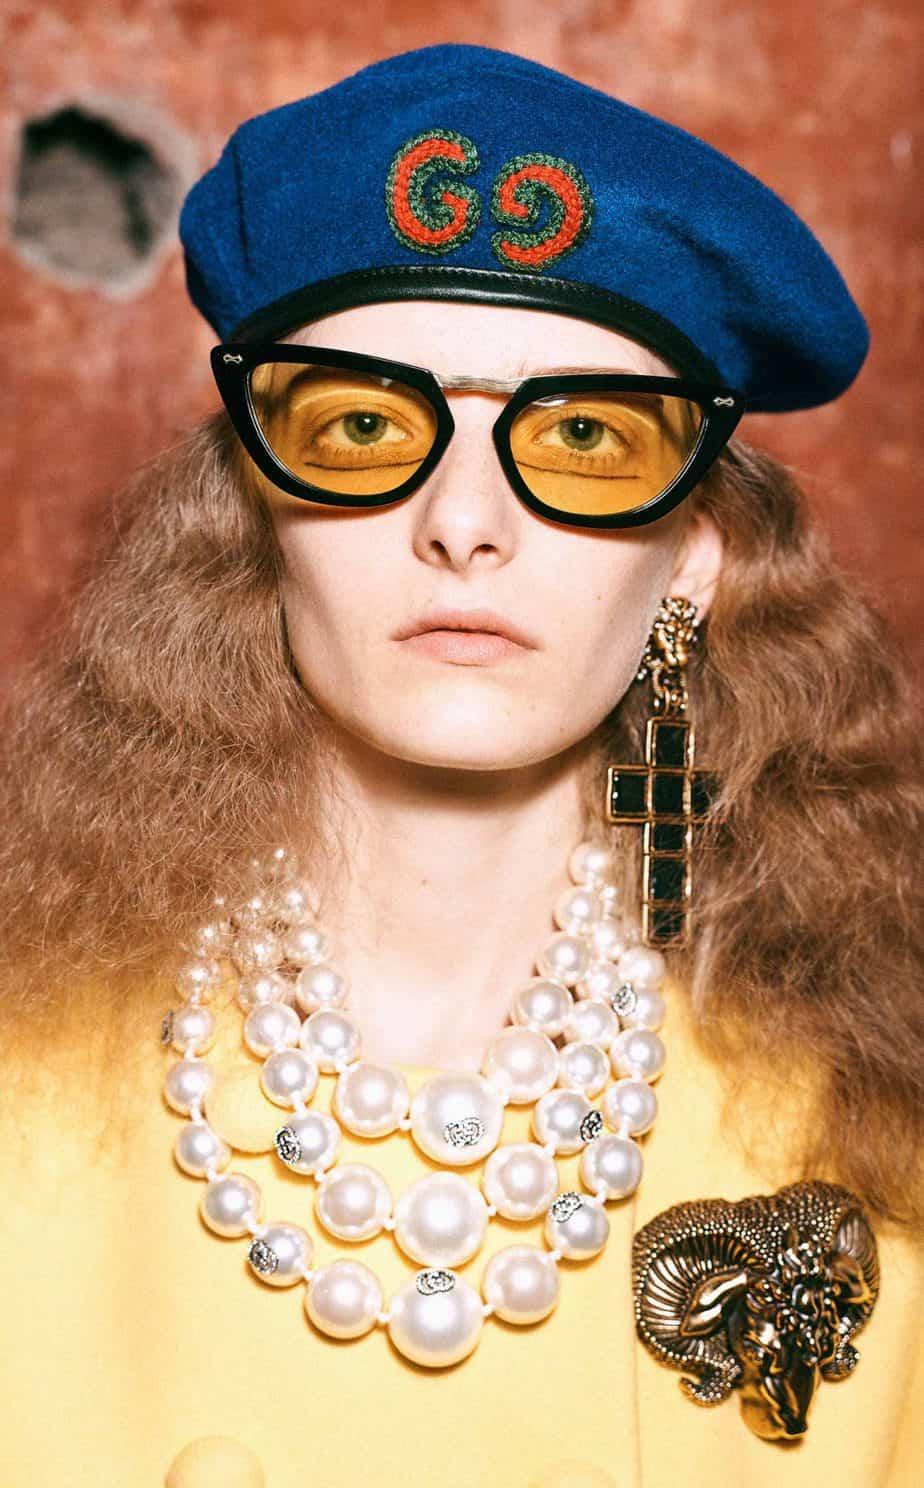 GUCCI, FALL 2019. WOMEN'S FASHION, Photographer Harmony Korine, Art Director, Christopher Simmonds - 29